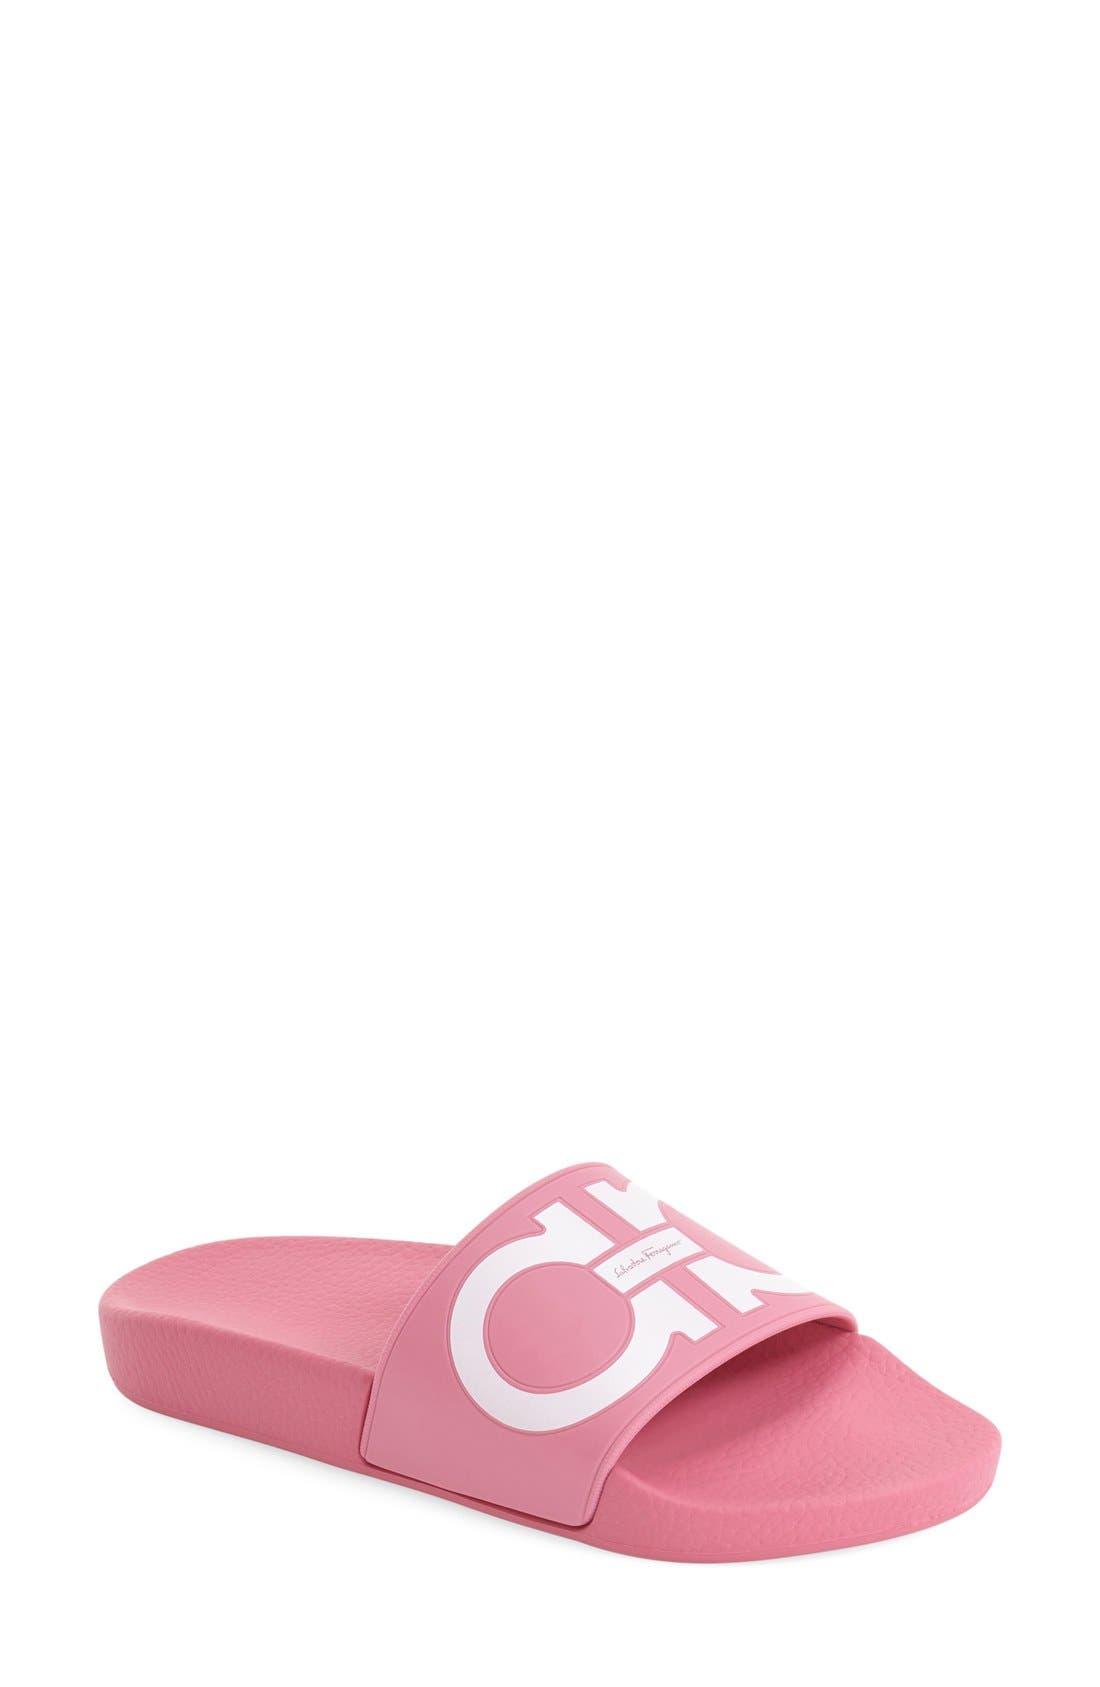 Groove Logo Slide Sandal,                         Main,                         color, Bubble Gum Pink/ White